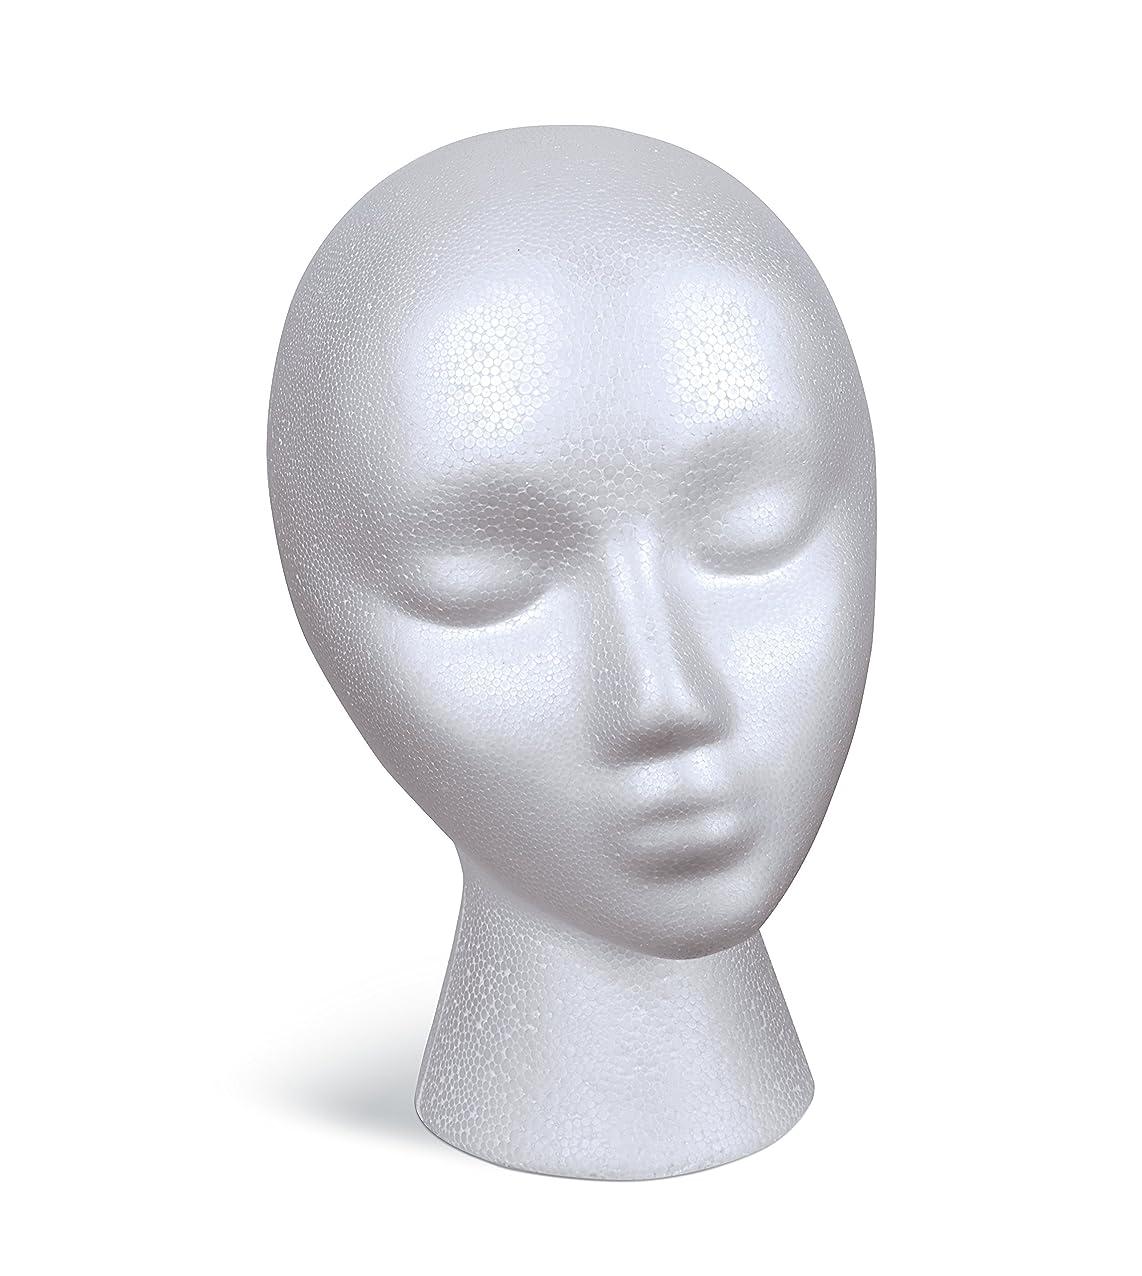 FloraCraft SmoothFoam Female Head 5.8 Inch x 7.5 Inch x 9.8 Inch White xtuqdhdmovoxr227